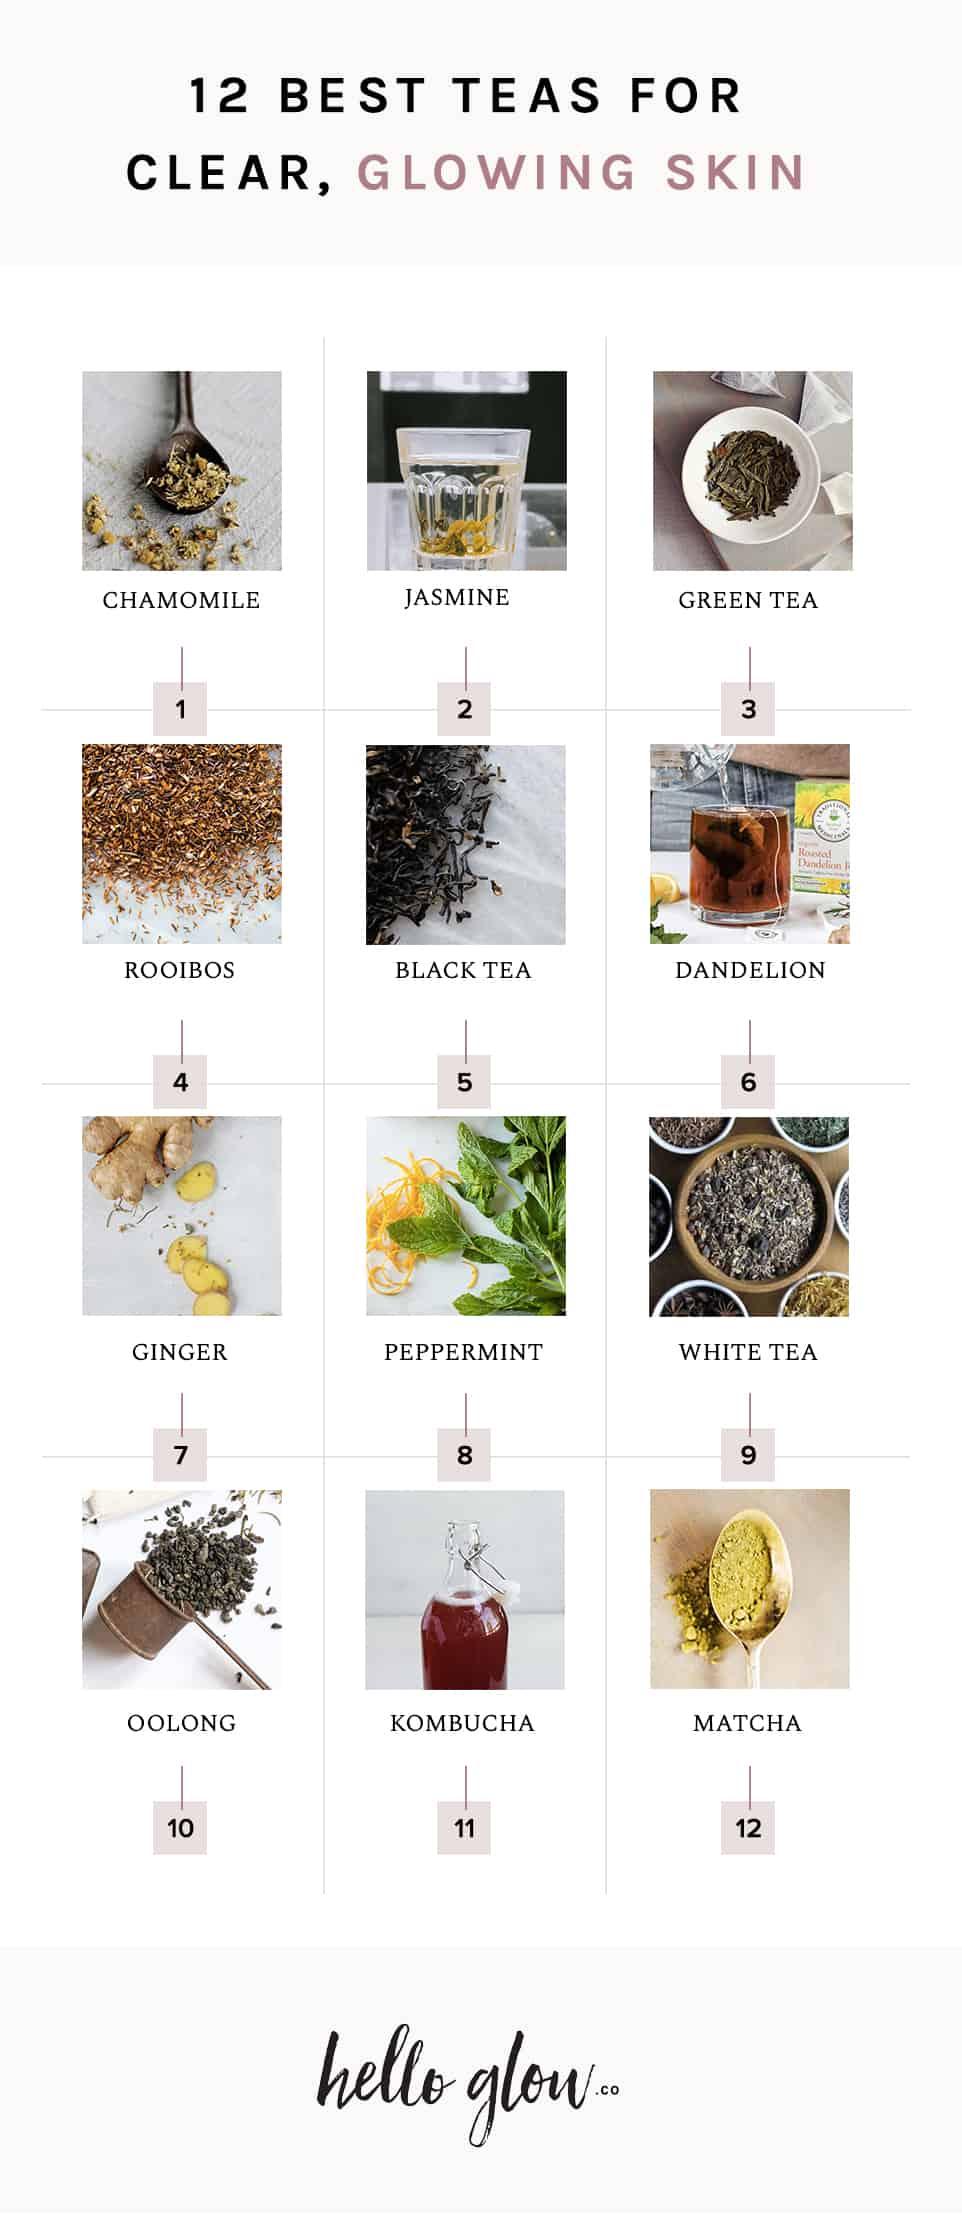 12 teh terbaik untuk kulit bersih dan bercahaya - HelloGlow.co